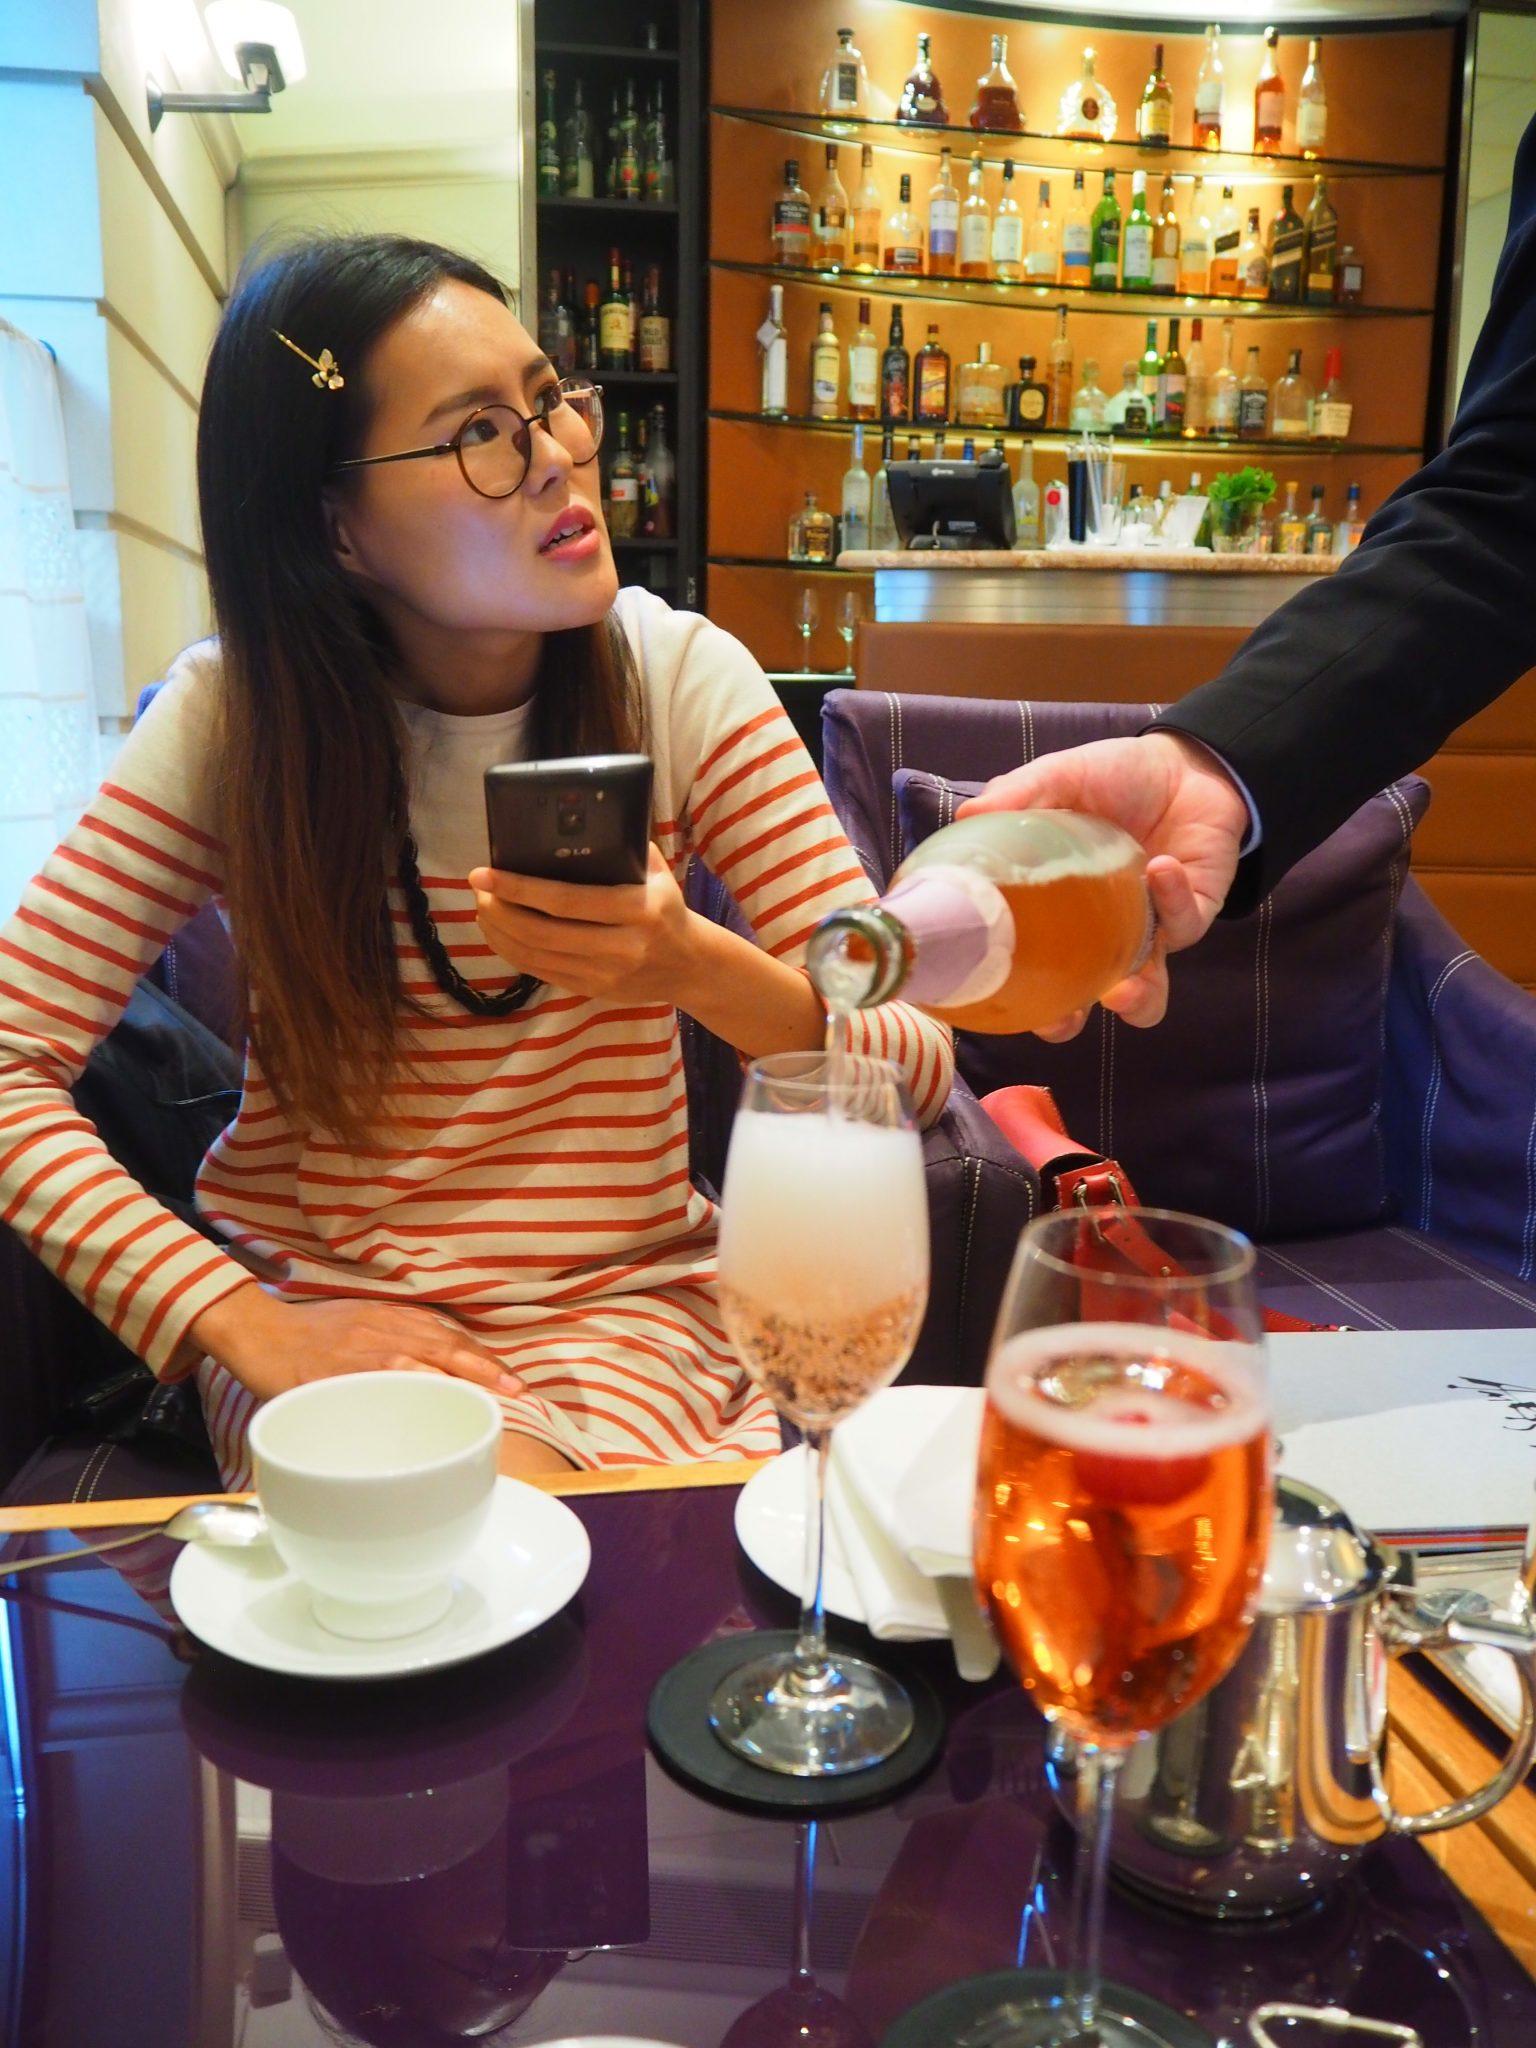 Spanish Afternoon Tea at the COMO The Halkin London